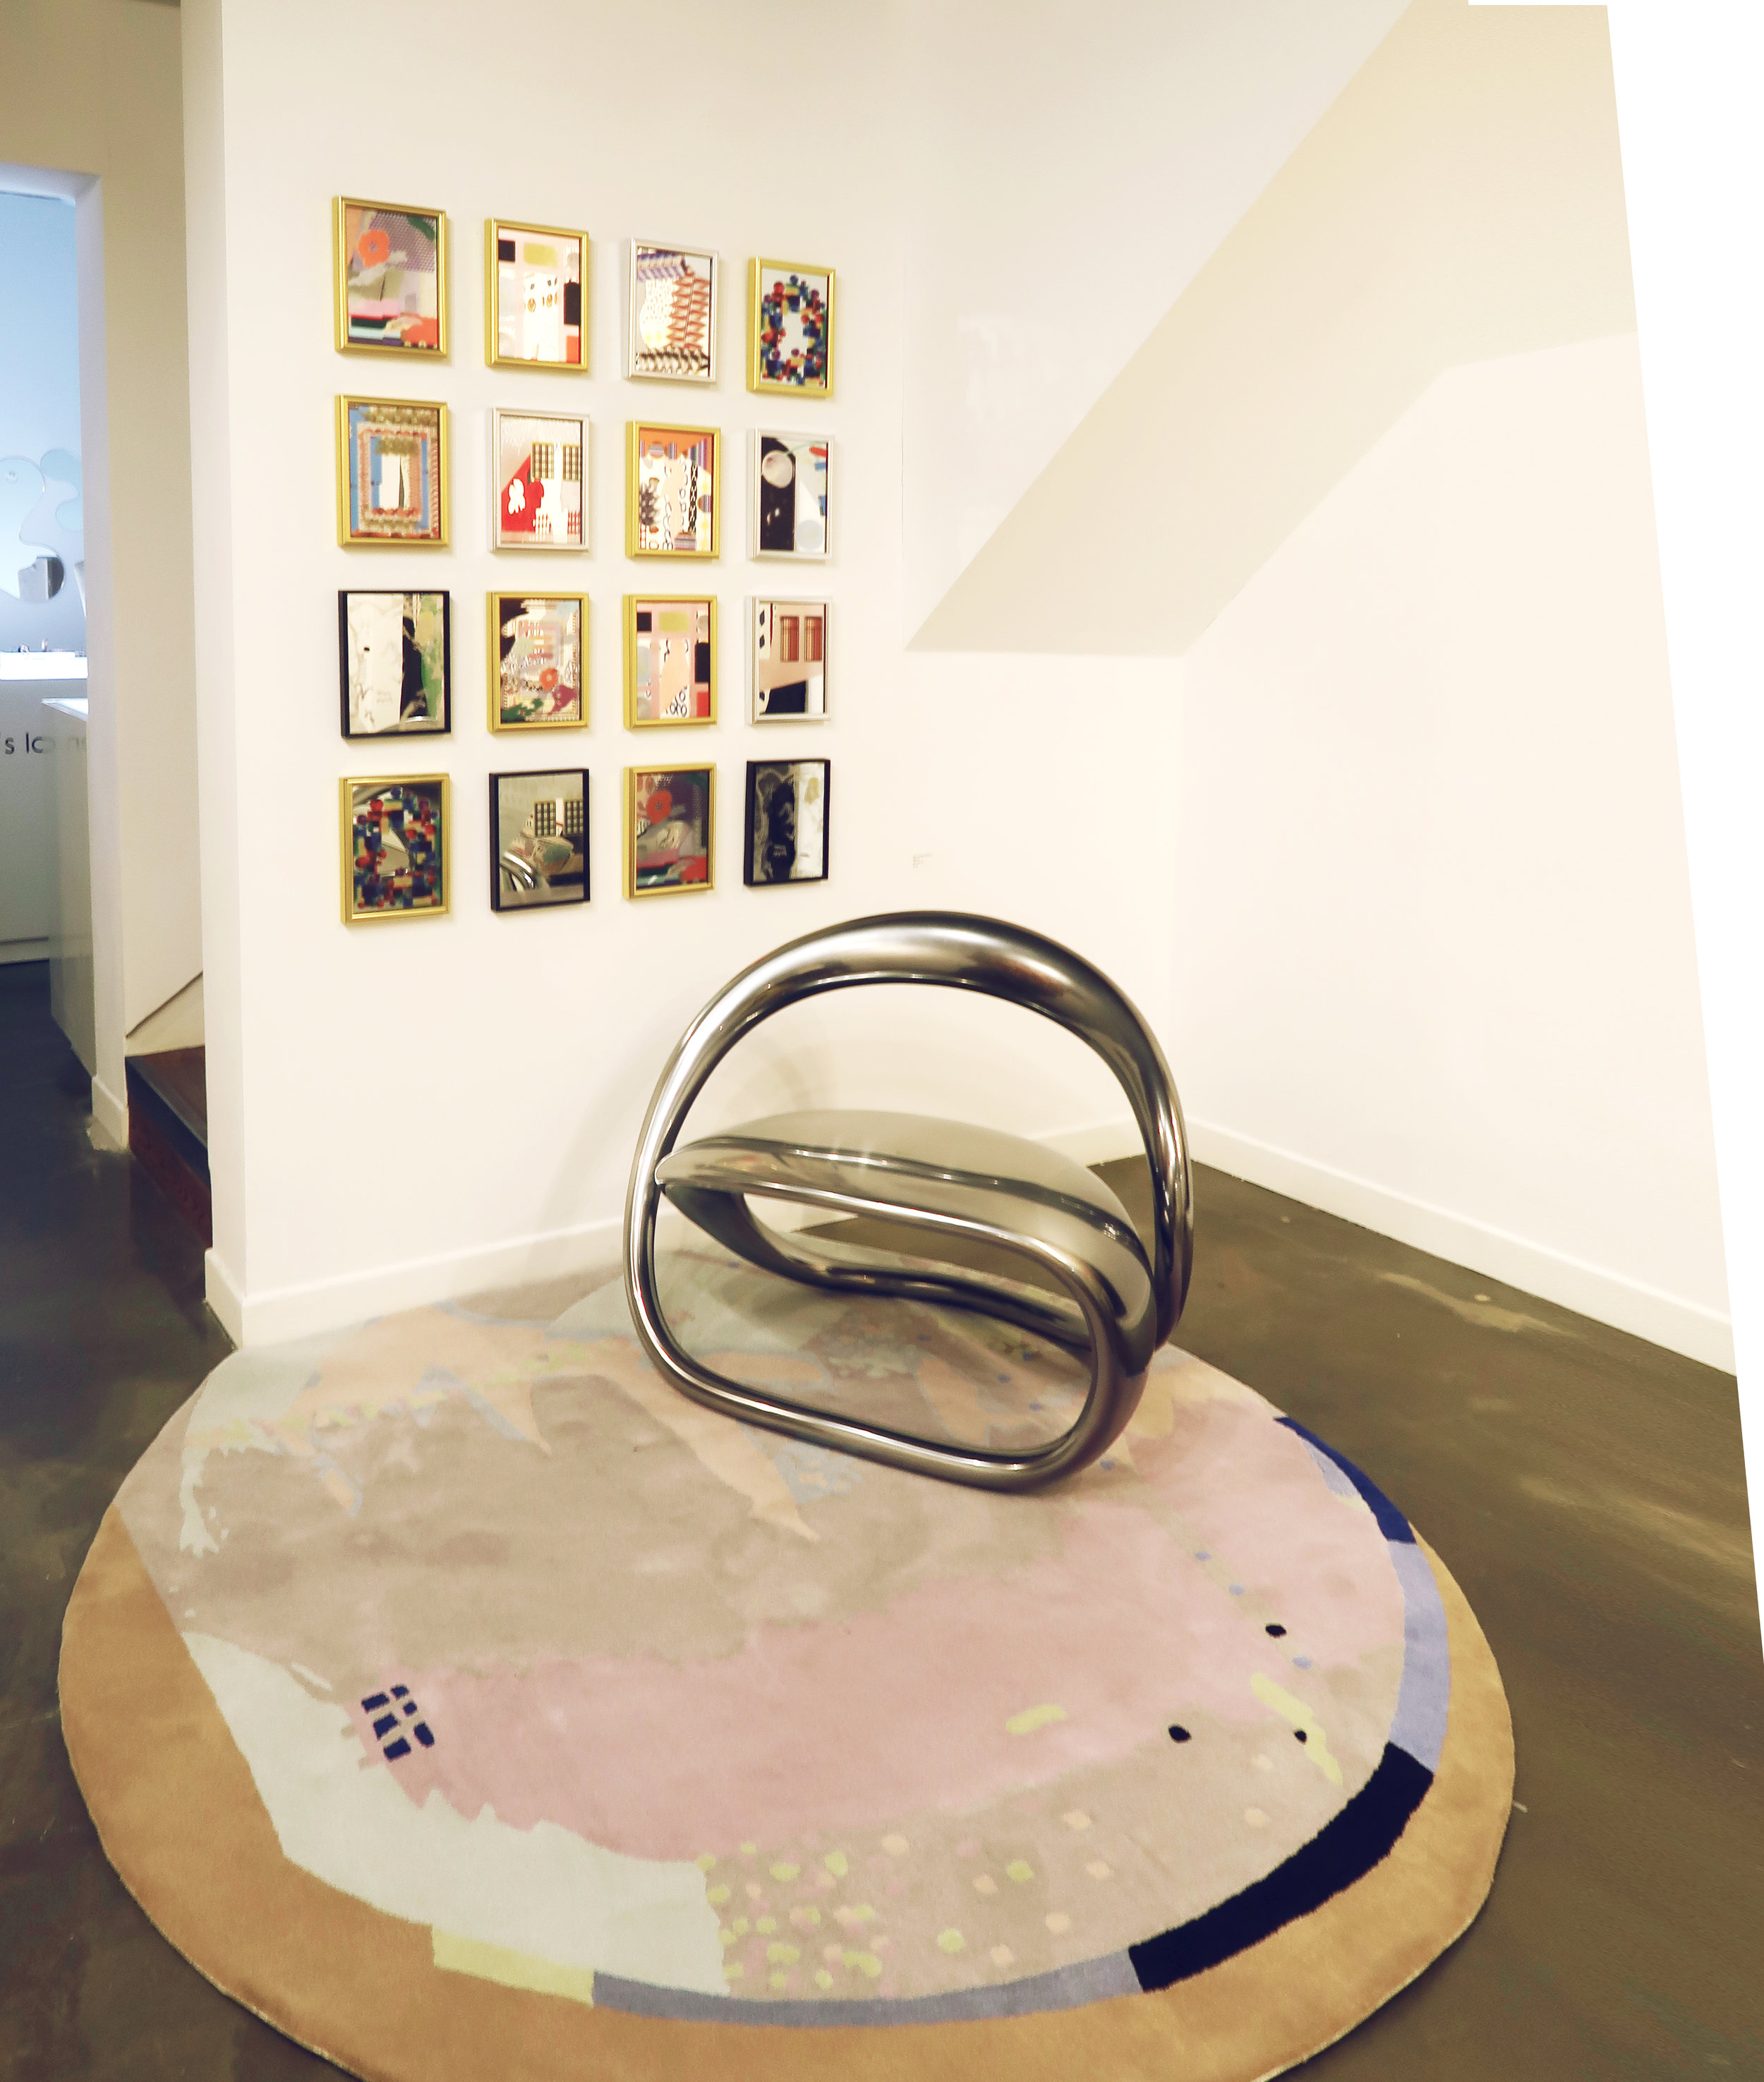 Mirror Mirror, 180mm * 240mm, Mirror  Surface, 1700mm * 1700mm, Wool, Hand-tufted Carpet